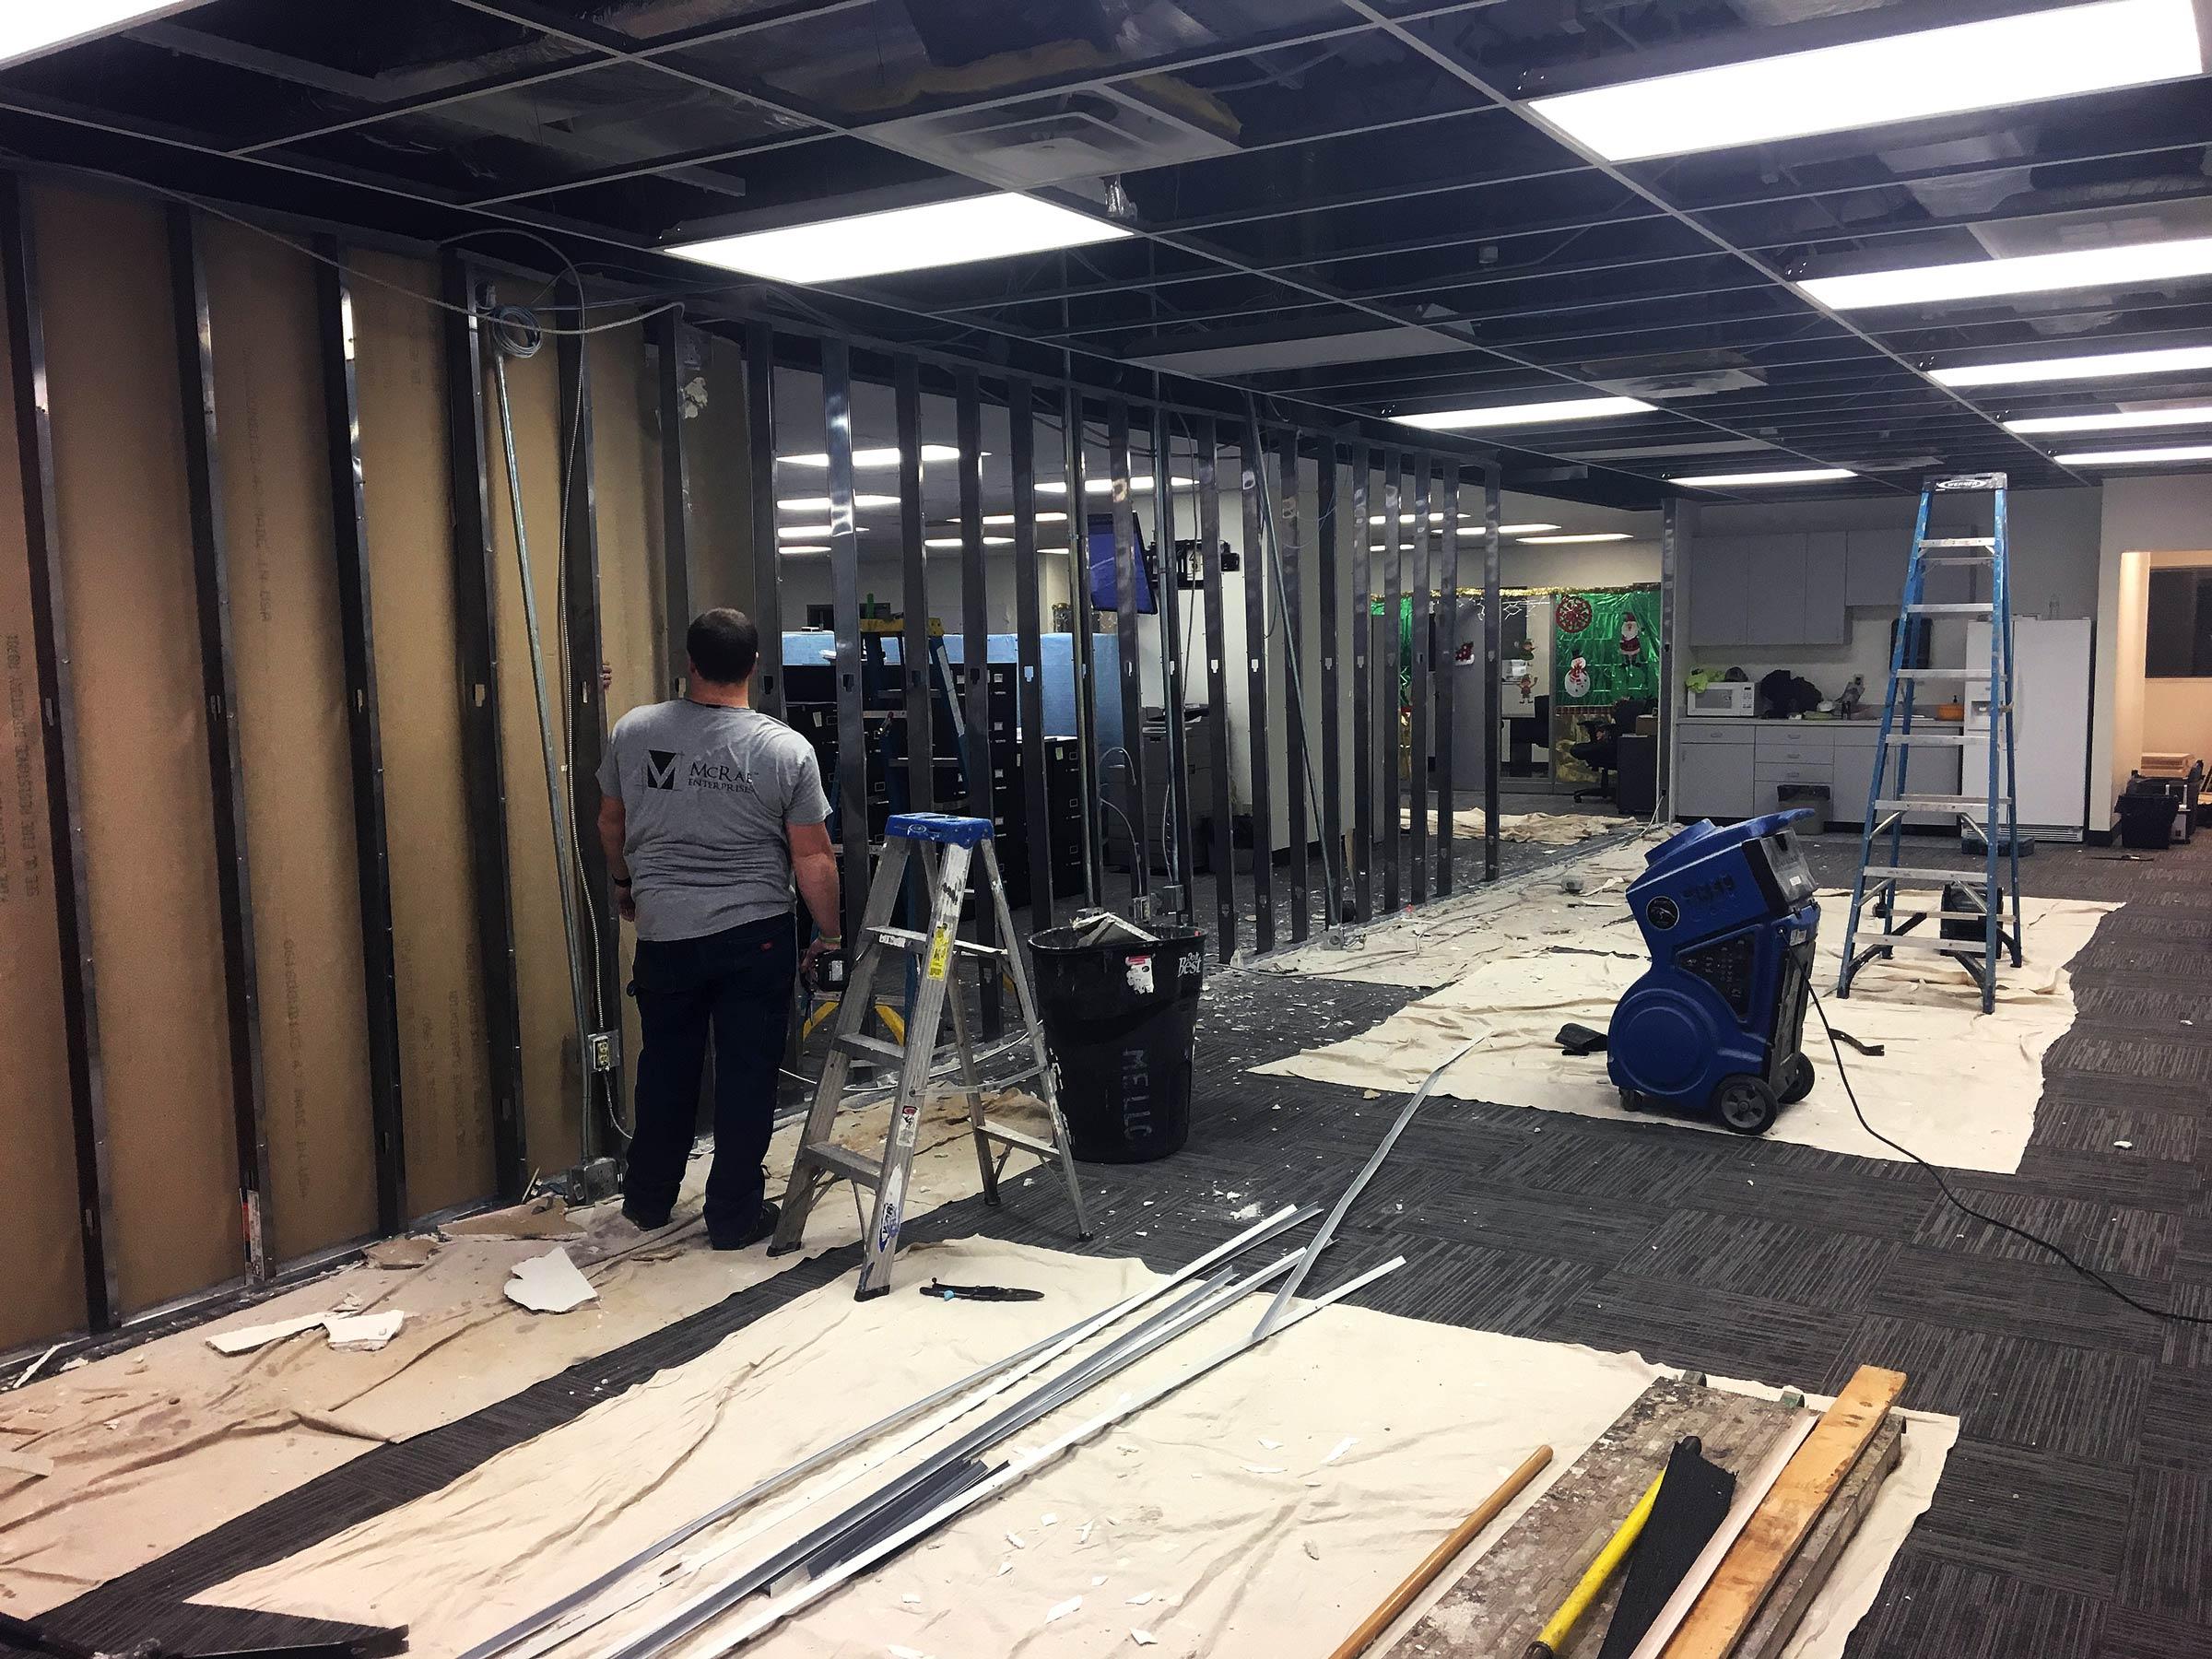 Commercial Development and Construction Management - McRae Enterprises - Serving Lexington, Louisville, Evansville, and all major cities of Ohio